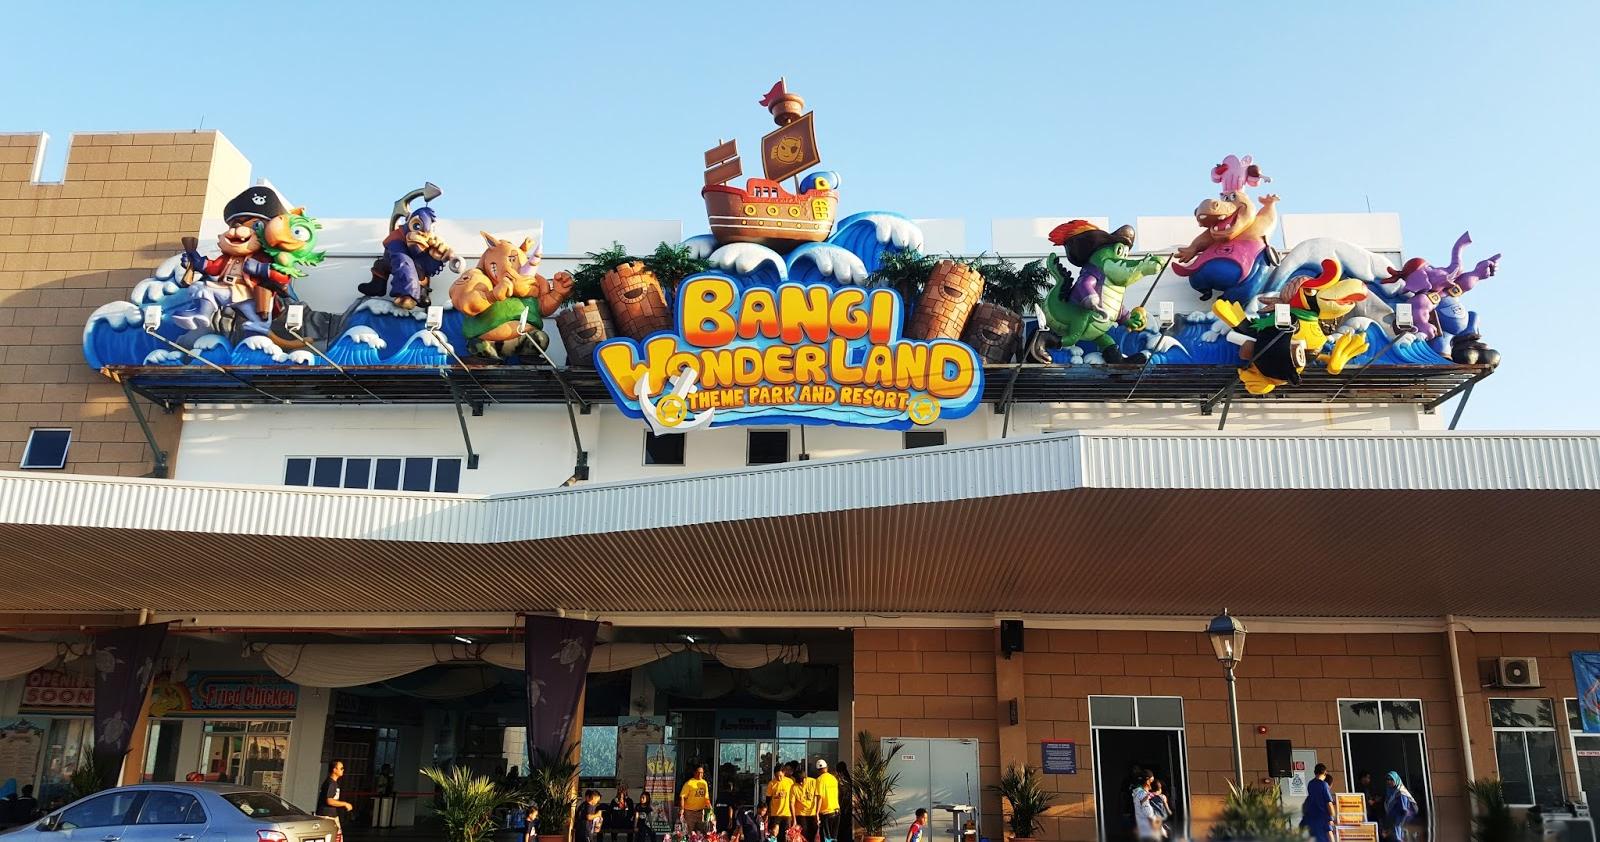 free-entry-for-march-babies-at-bangi-wonderland-world-of-buzz-8 Of Bangi Wonderland Theme Park & Resort Di Selangor Lokasi Mandi Manda Yang Sangat Indah Untuk Pelancong